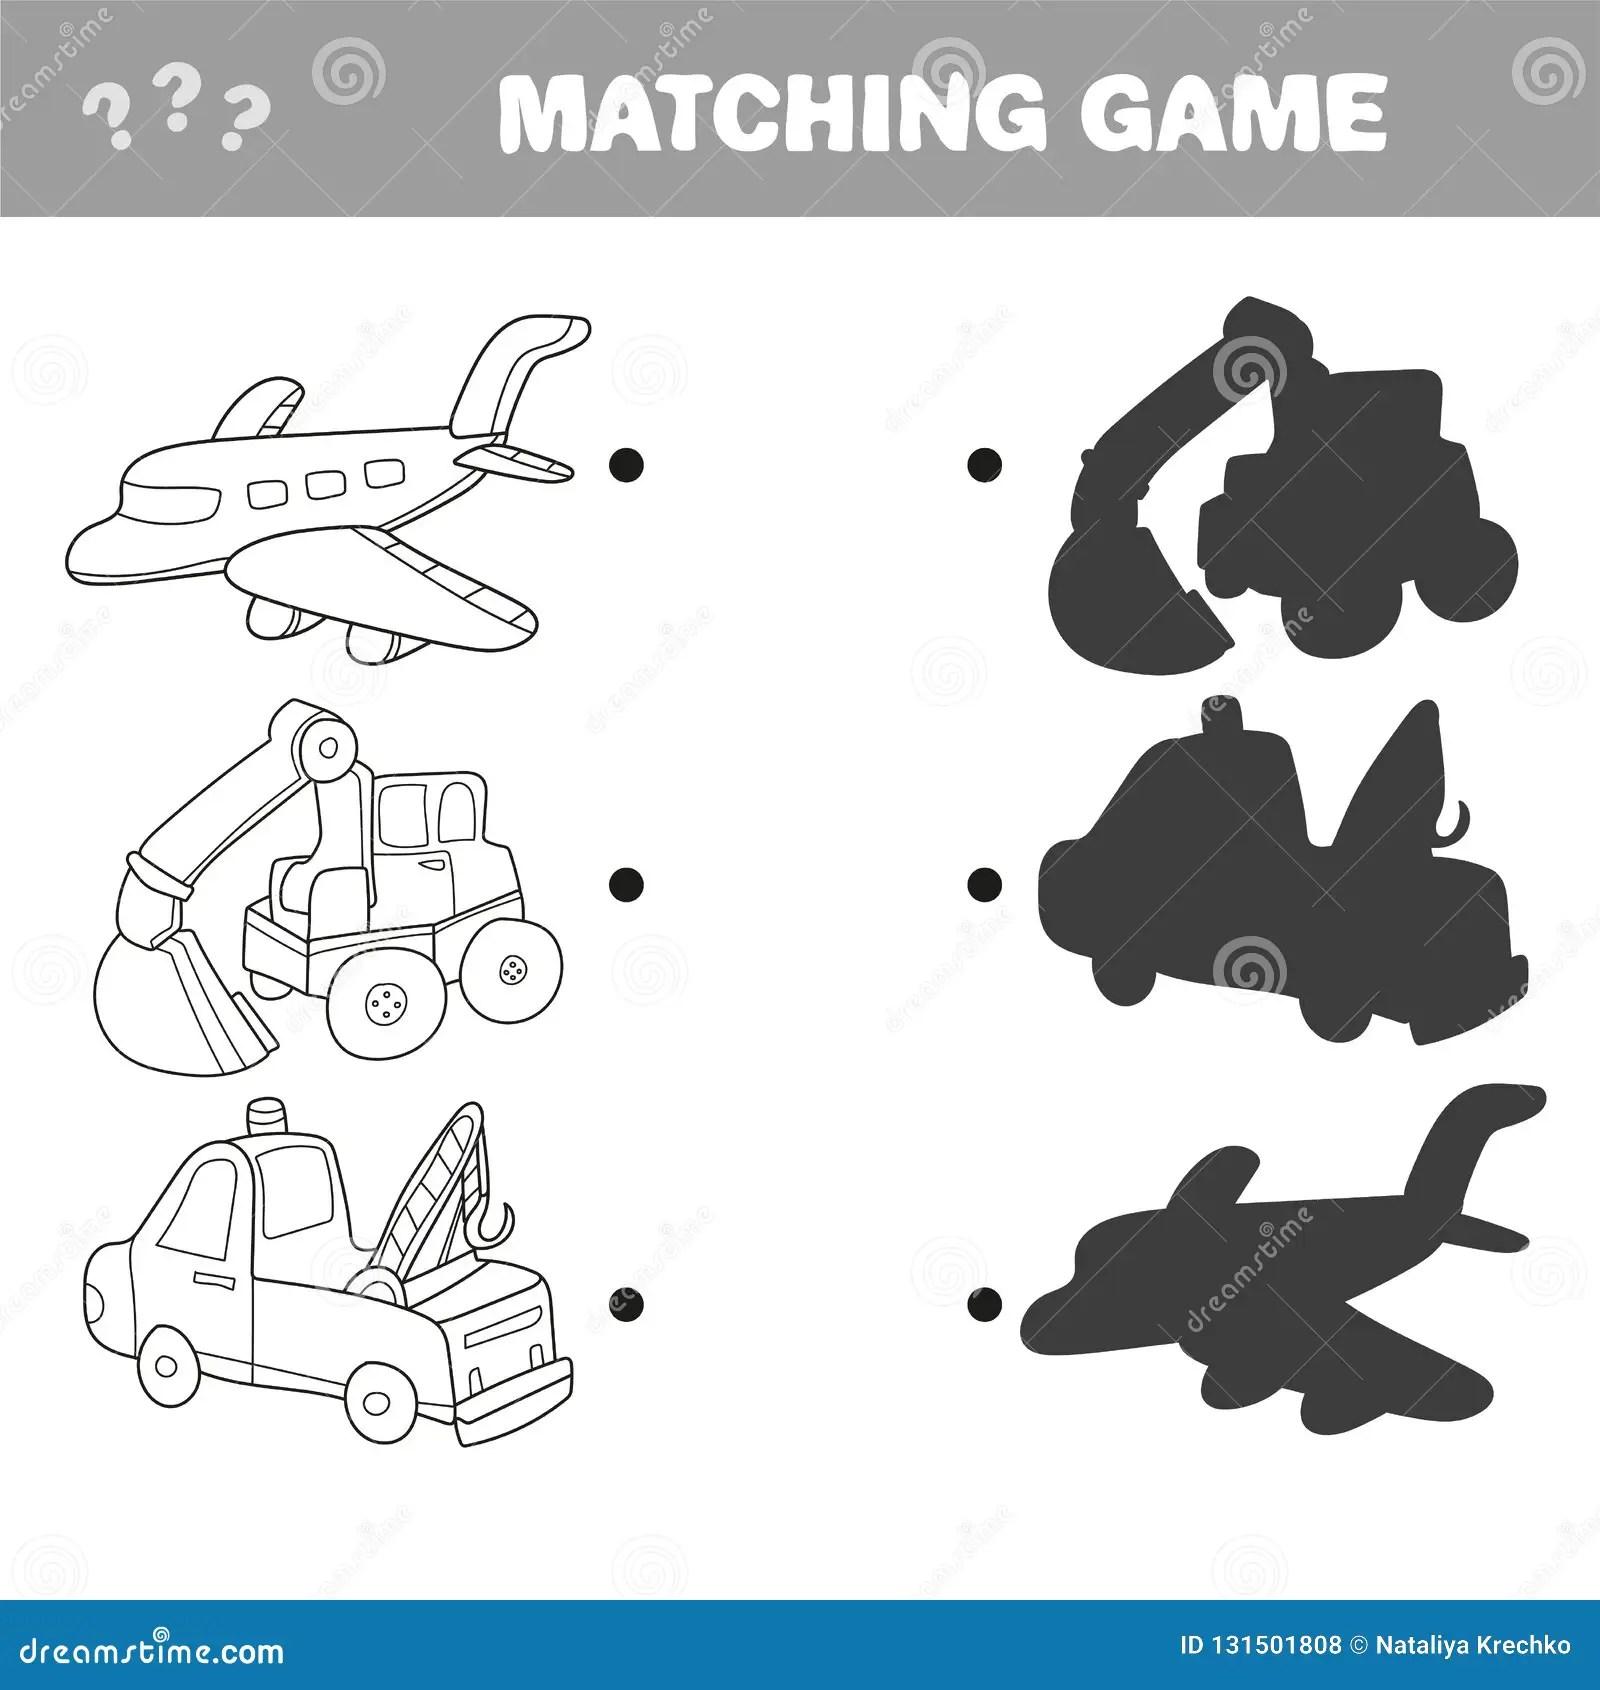 Cartoon Vector Illustration Of Education Shadow Matching